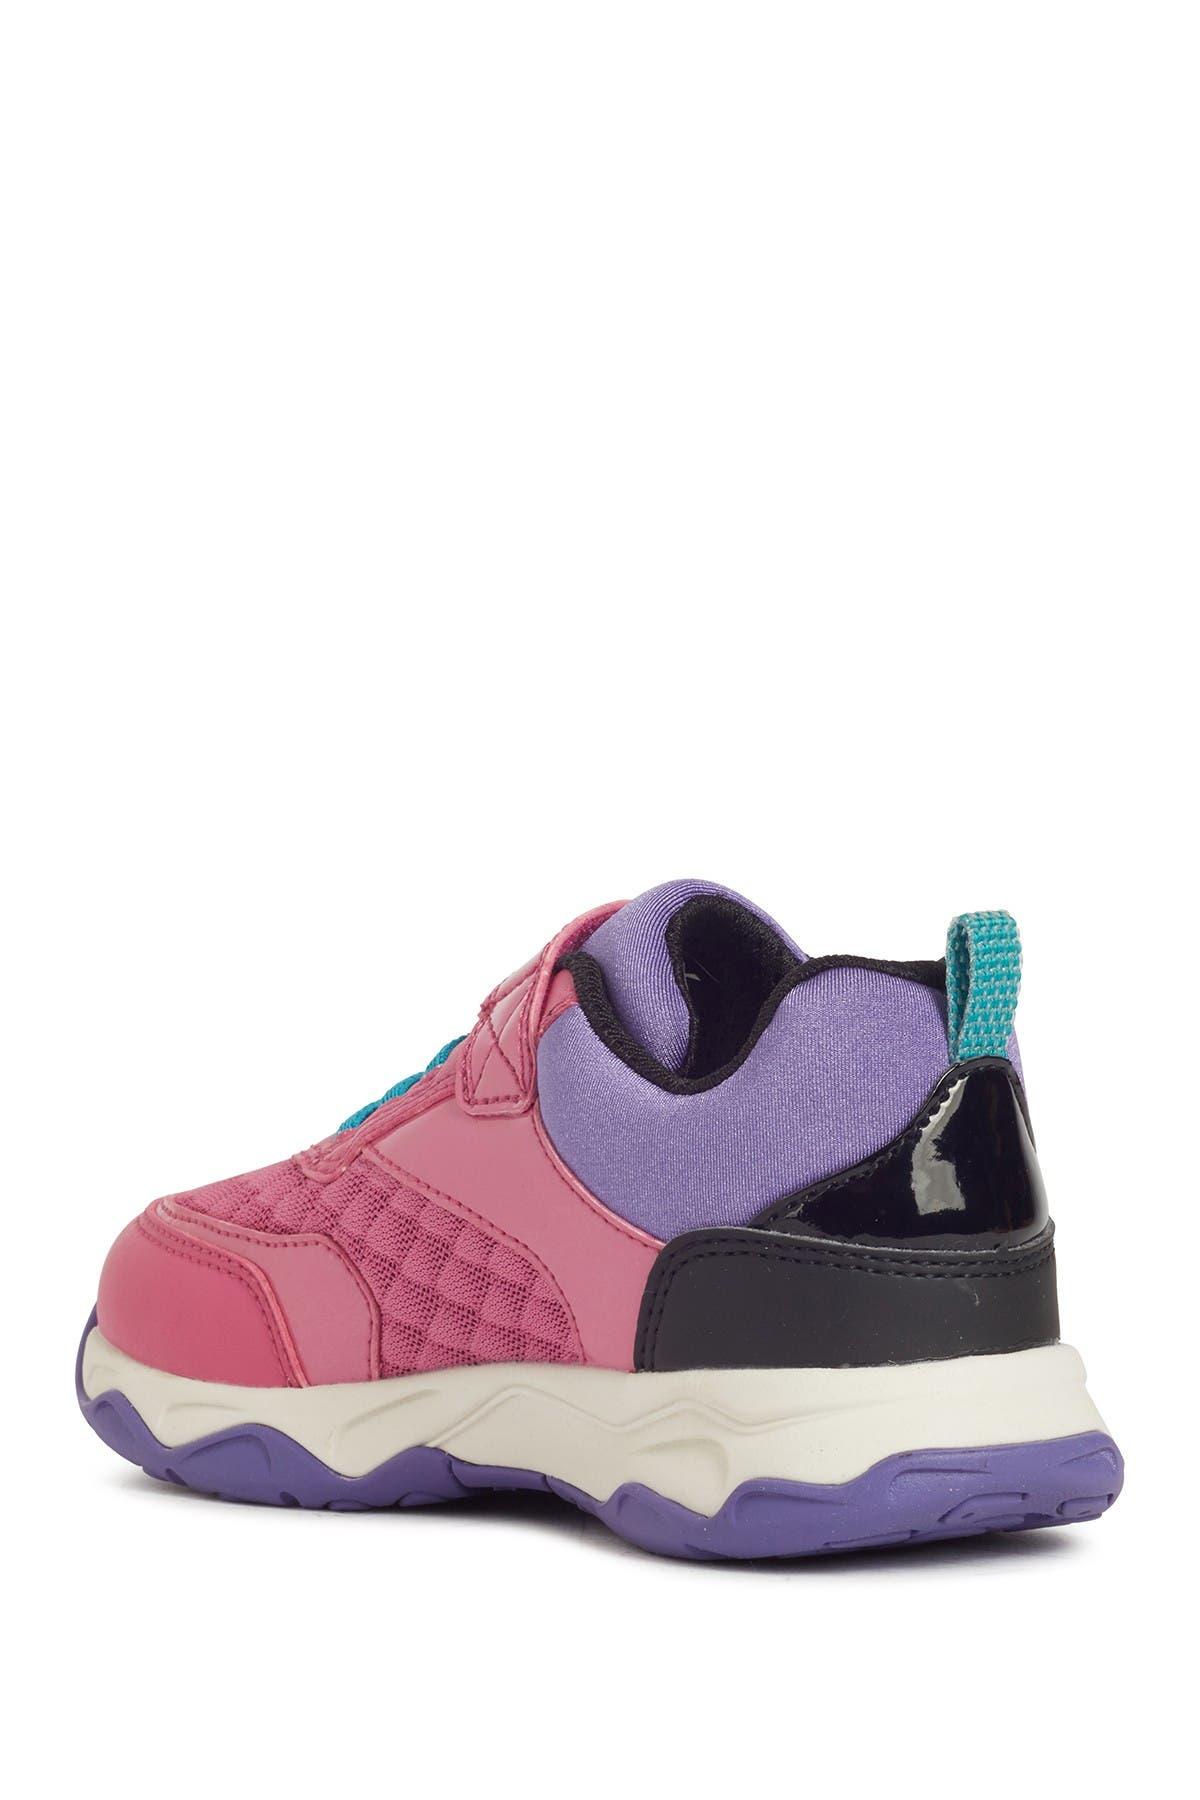 GEOX Calco Sneaker